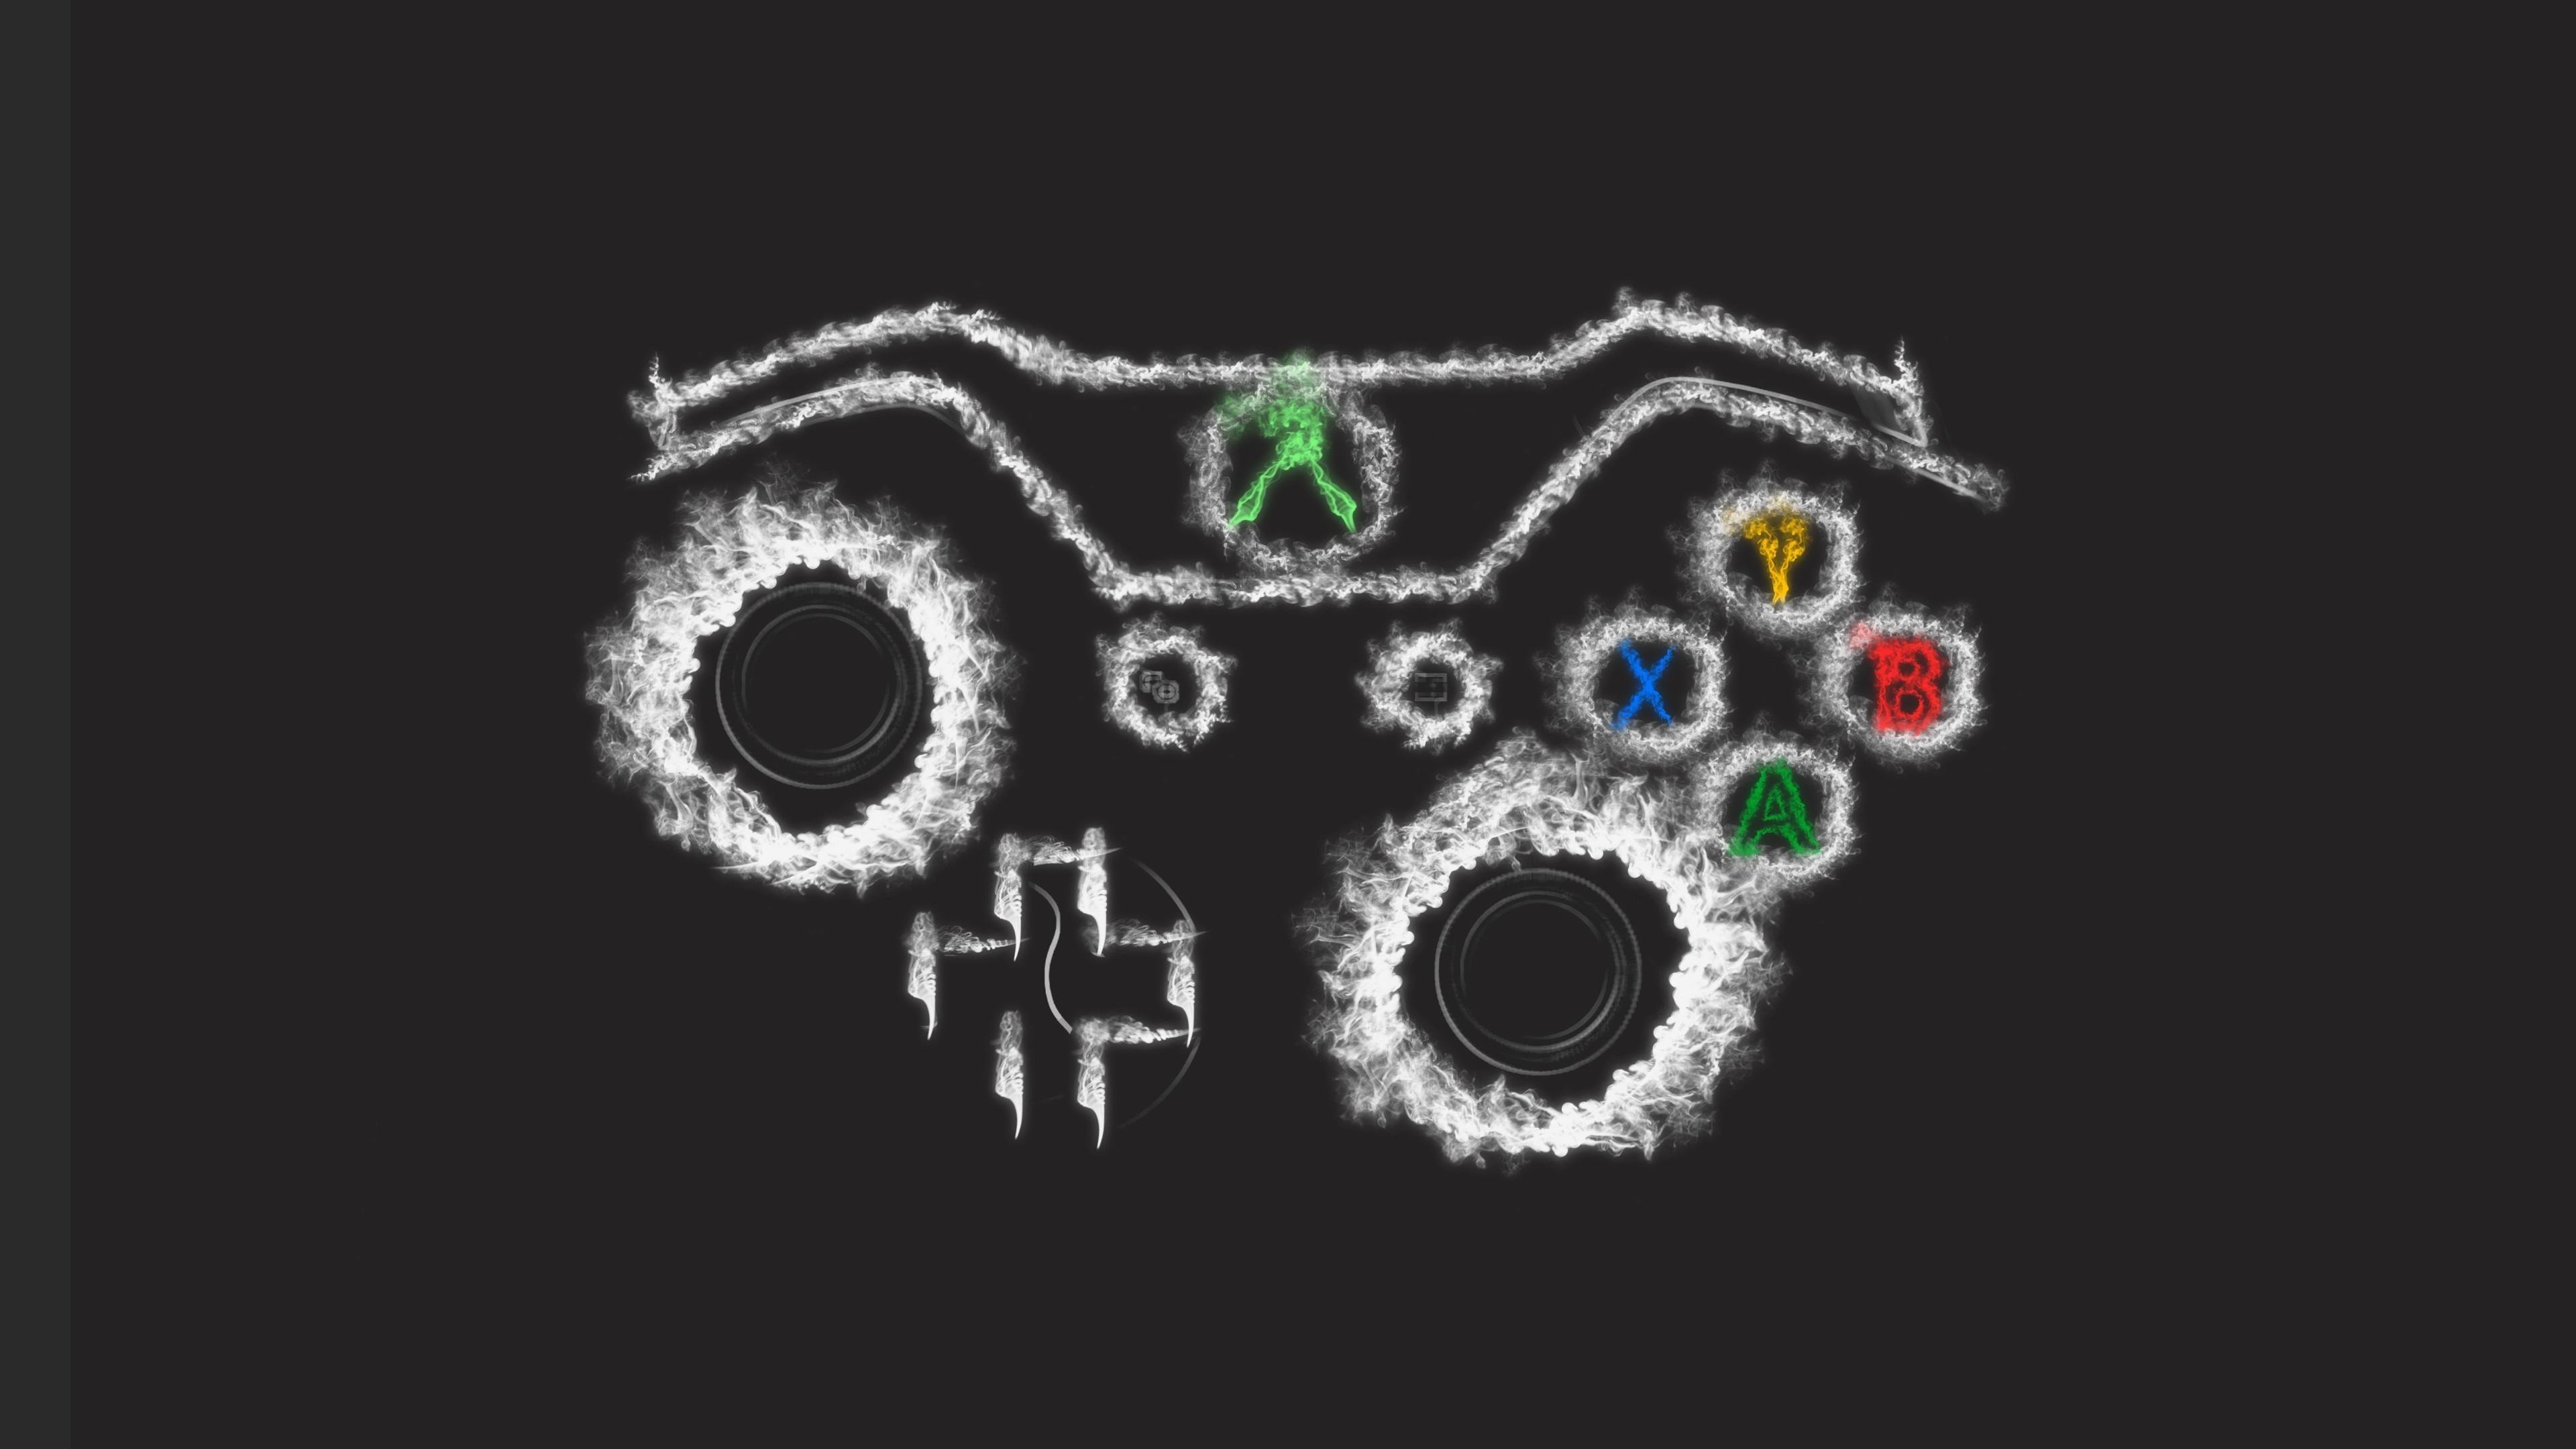 Res: 3840x2160, 2880x1800 Scorpion - Mortal Kombat X wallpaper - Game wallpapers - #30997